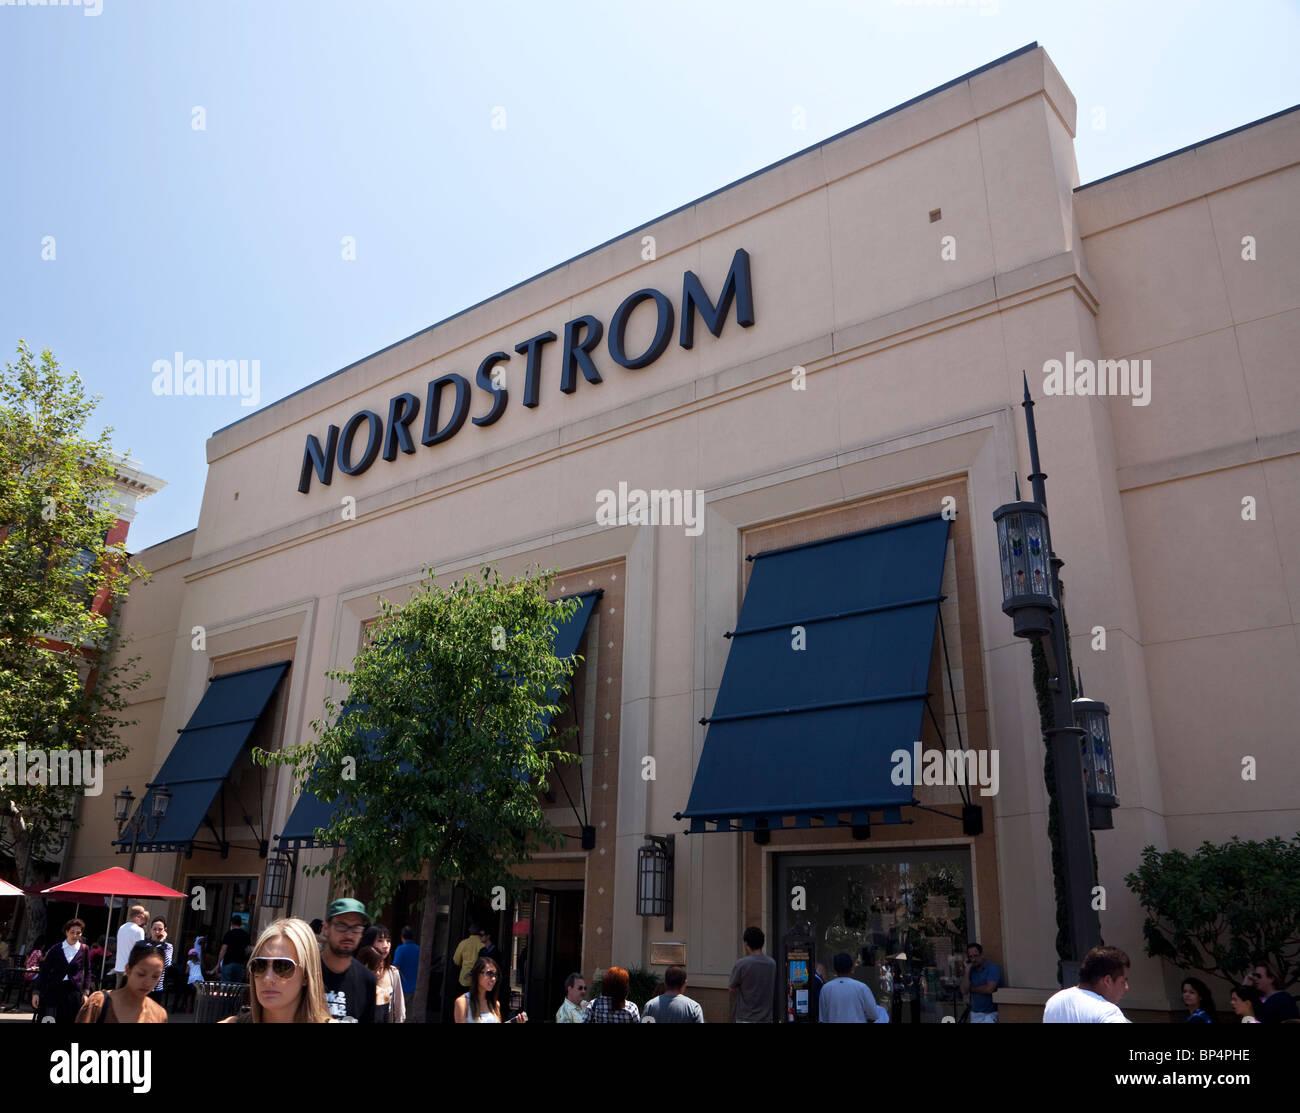 Los Angeles Supermarket: Nordstrom Department Store Stock Photos & Nordstrom